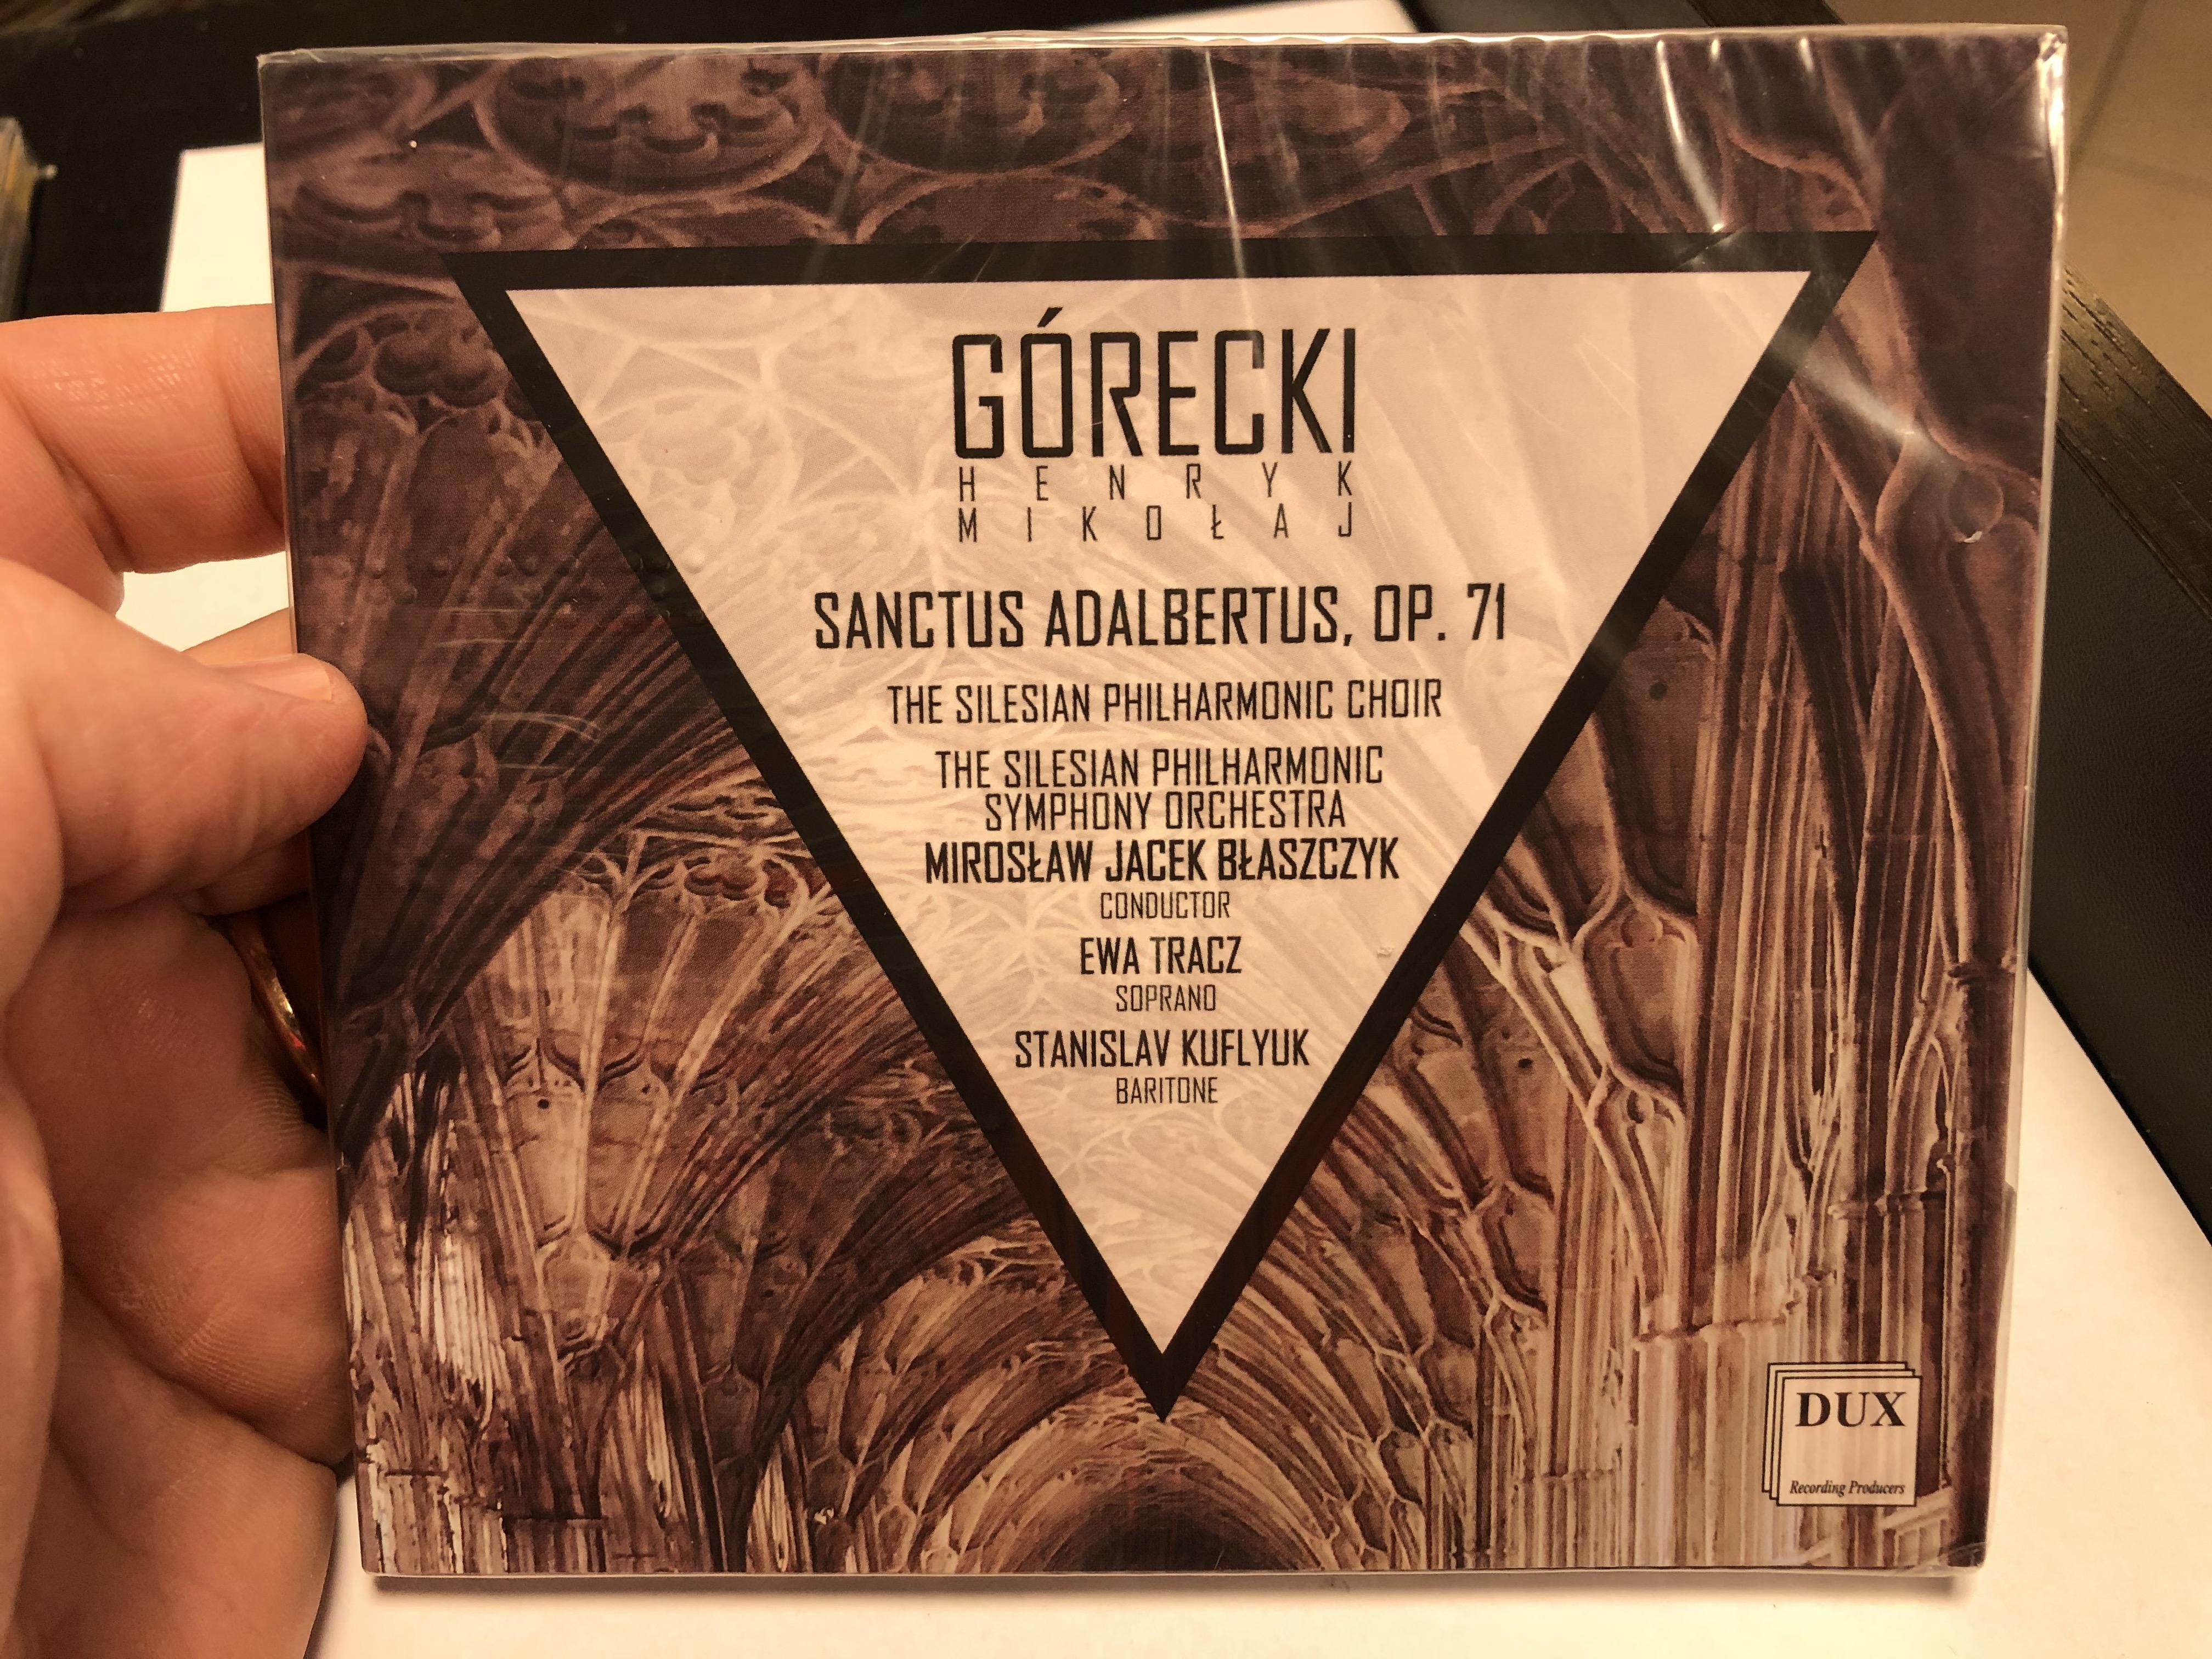 gorecki-henryk-mikolaj-sanctus-adalbertus-op.-71-the-silesian-philharmonic-choir-the-silesian-philharmonic-symphony-orchestra-miroslaw-jacek-blaszczyk-conductor-ewa-tracz-soprano-d-1-.jpg